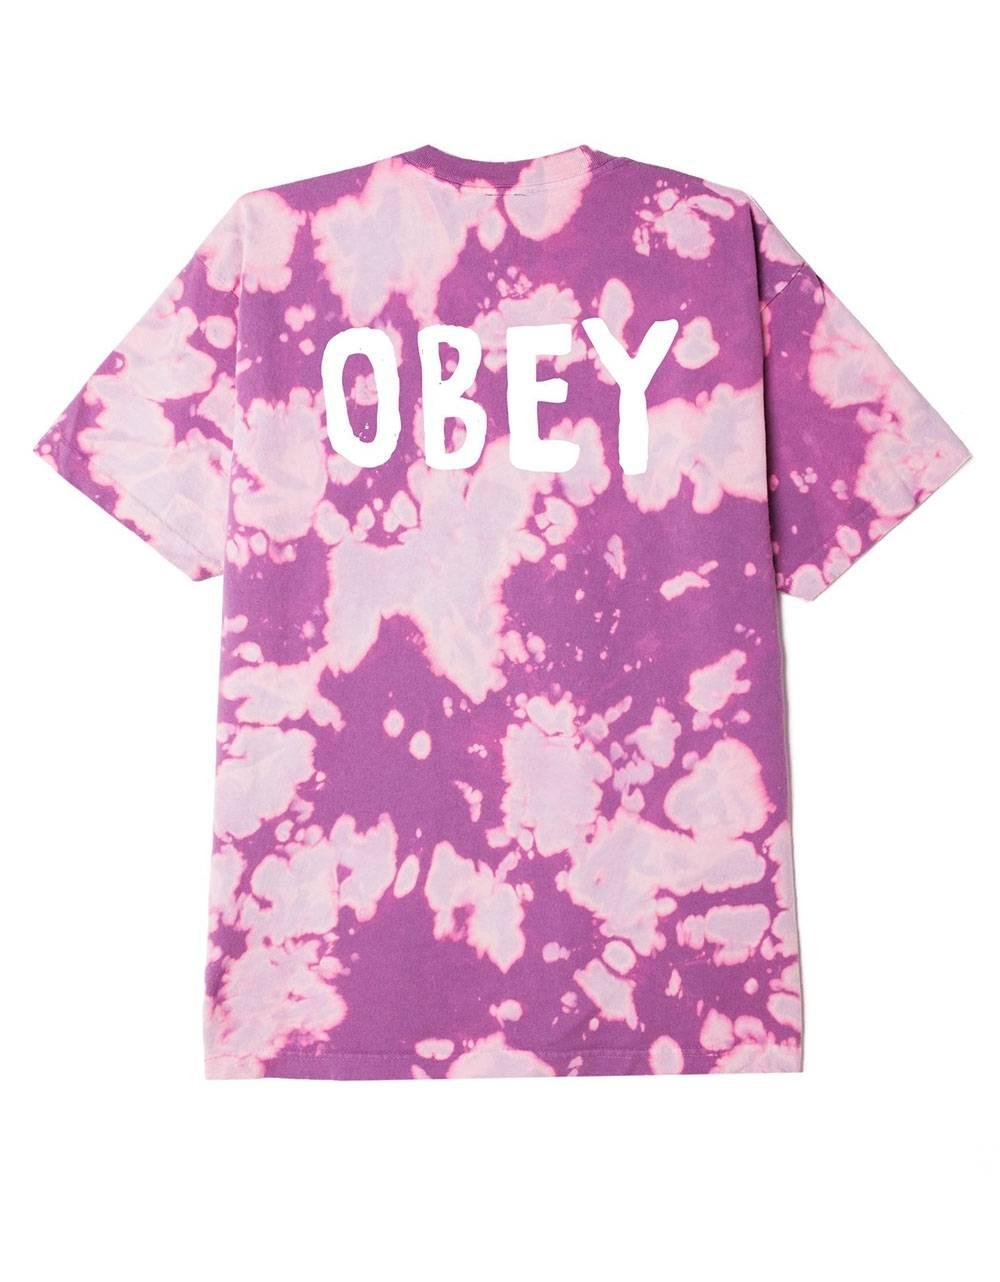 Obey OG heavyweight bleach tie dye t-shirt - purple nitro obey T-shirt 59,00€